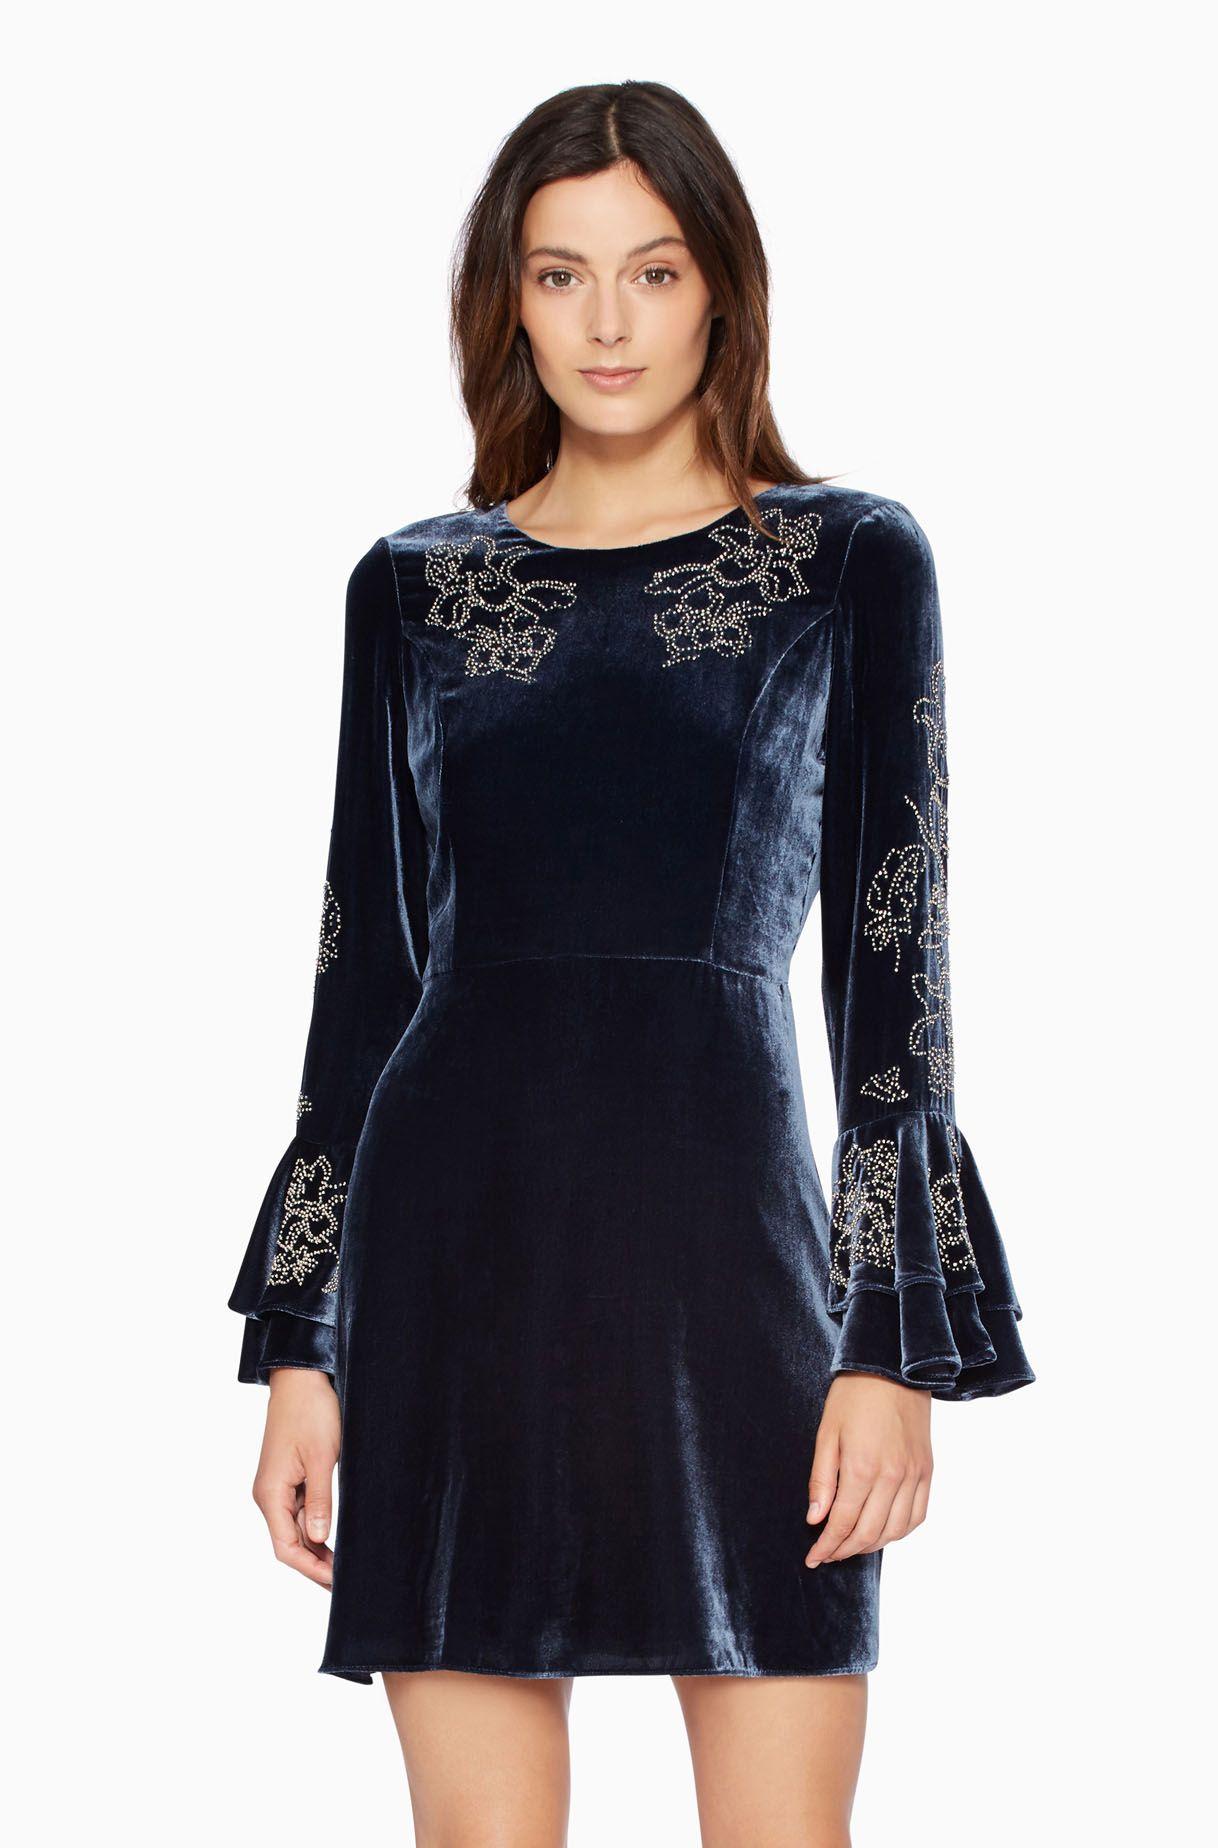 Donatella Dress | Moda: Dia-a-dia/Outfit | Pinterest